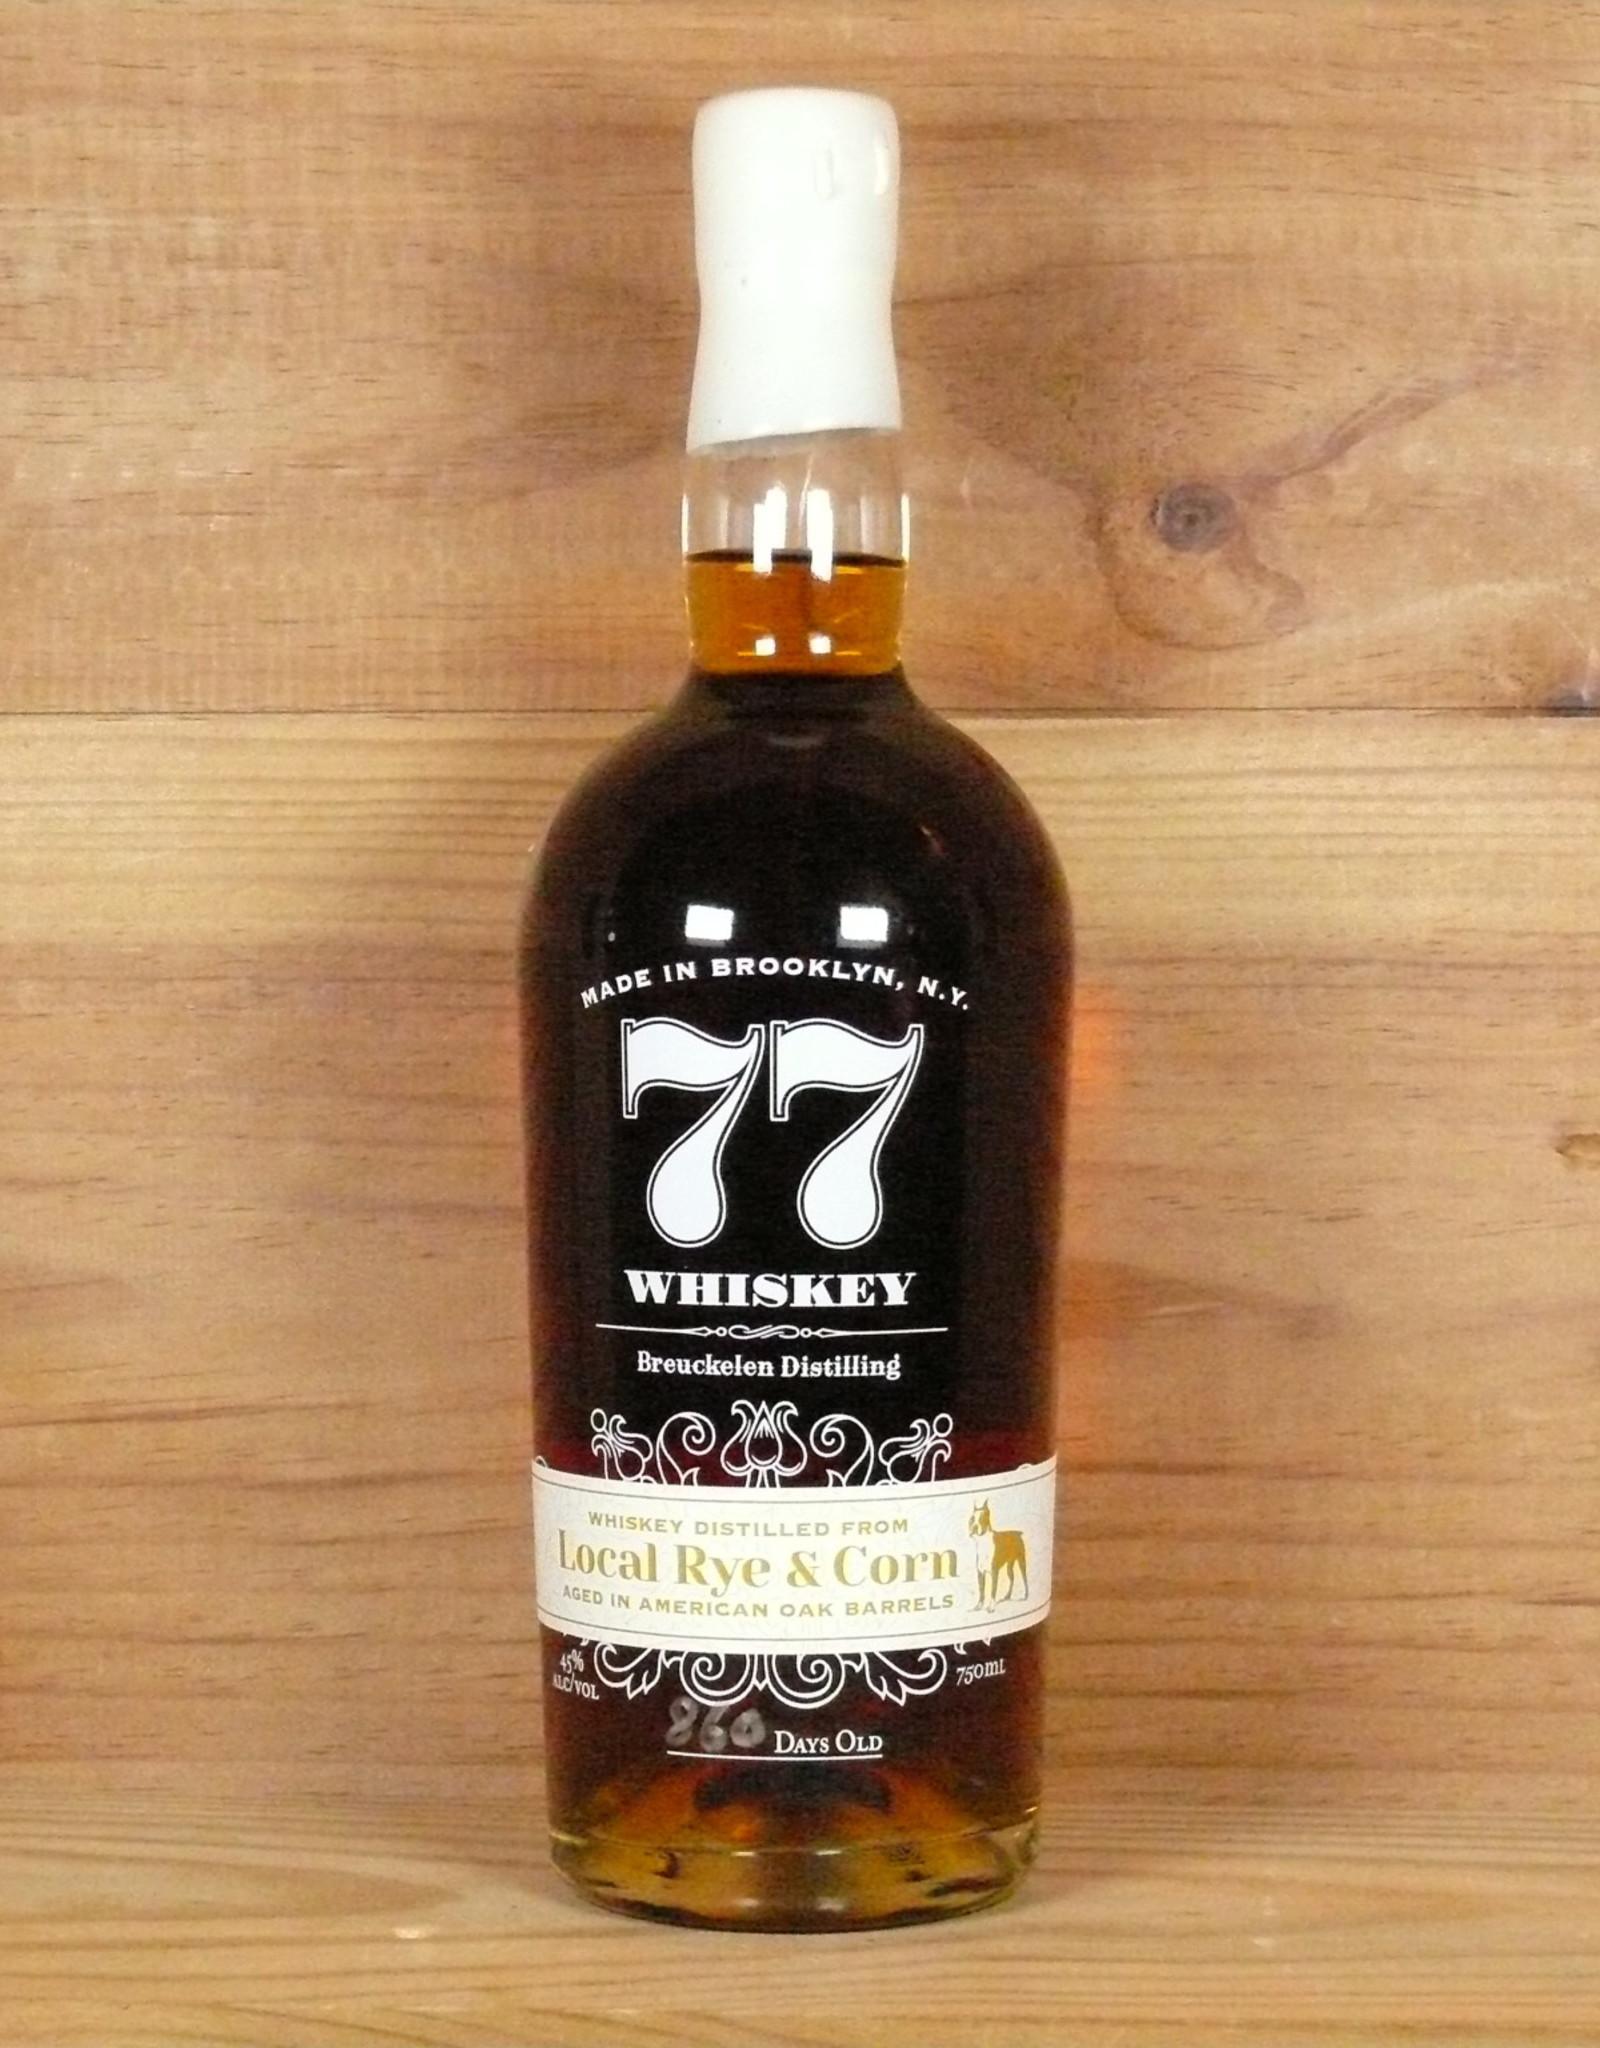 Breuckelen Distilling '77 Whiskey' Local Rye & Corn